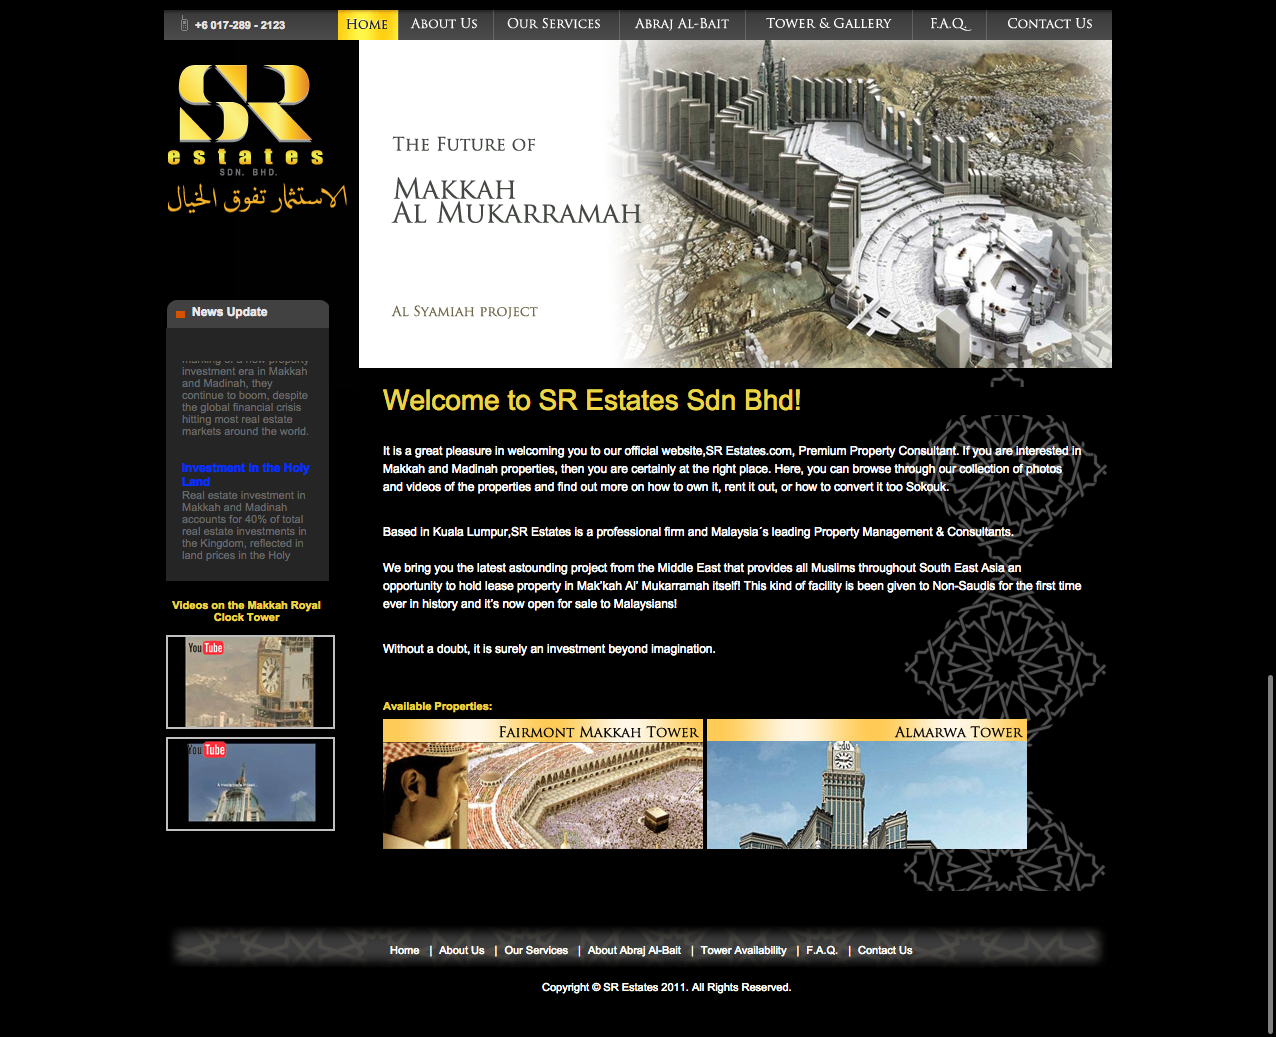 SR Estates Sdn Bhd